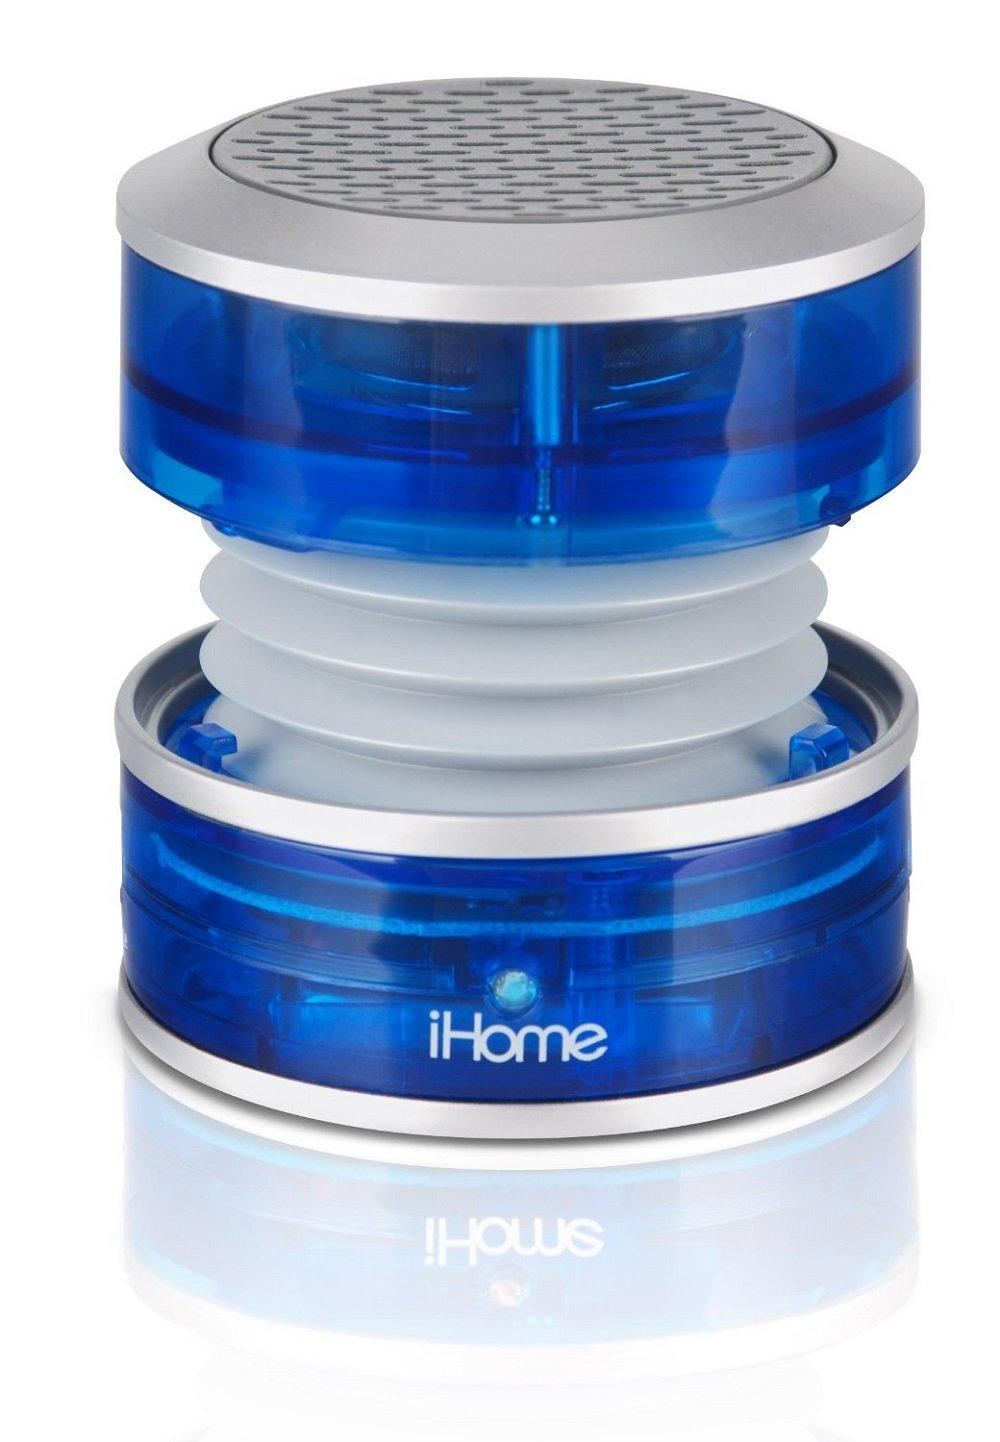 Amazon.com: iHome iM60LT Rechargeable Mini Speaker - Blue: Home ...